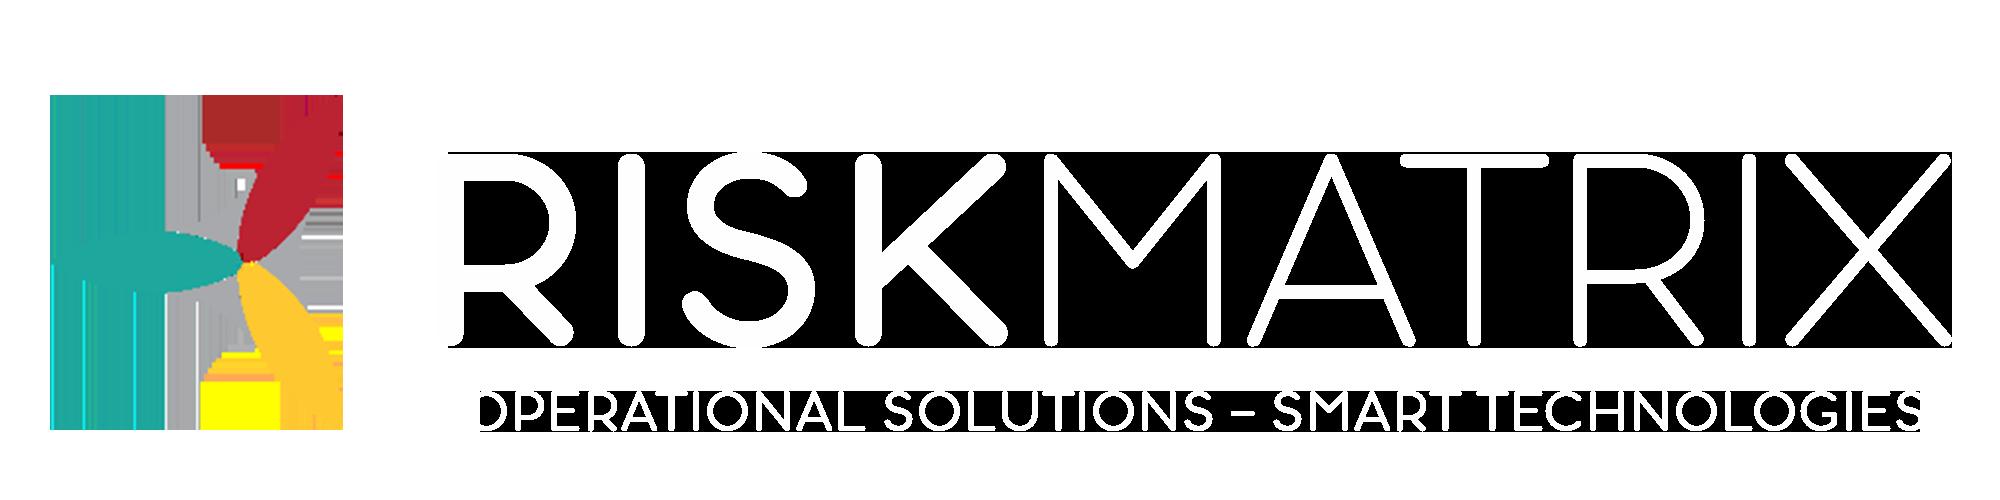 RiskMatrix